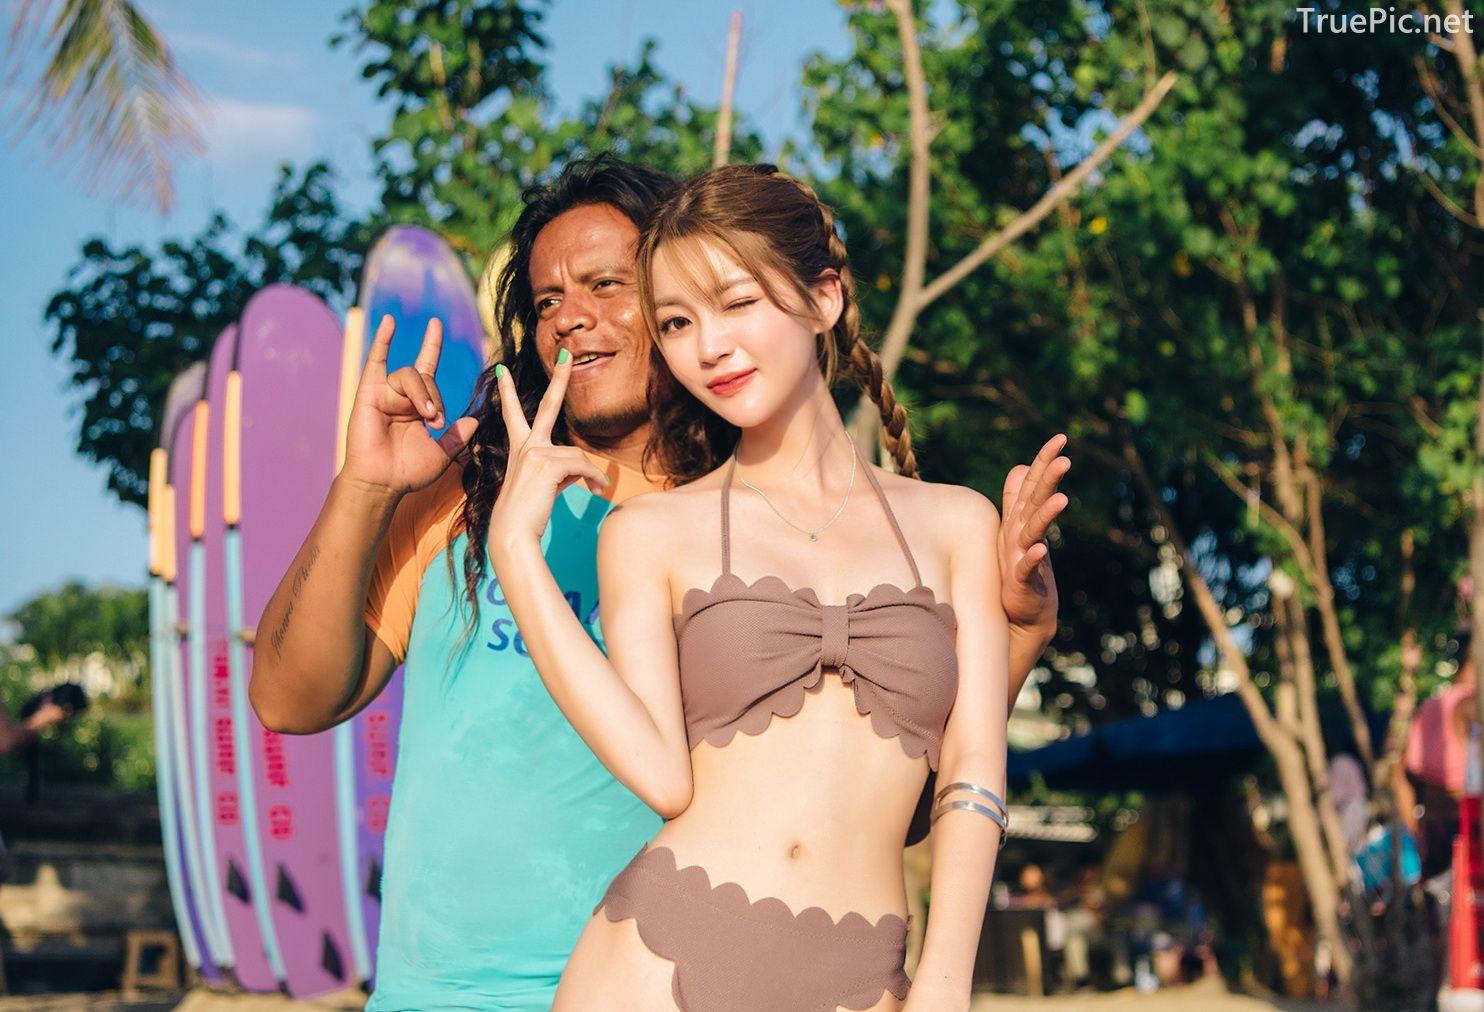 Korean cute model - Cha Yoo Jin - Mermaid Waves Tube Top Bikini - TruePic.net